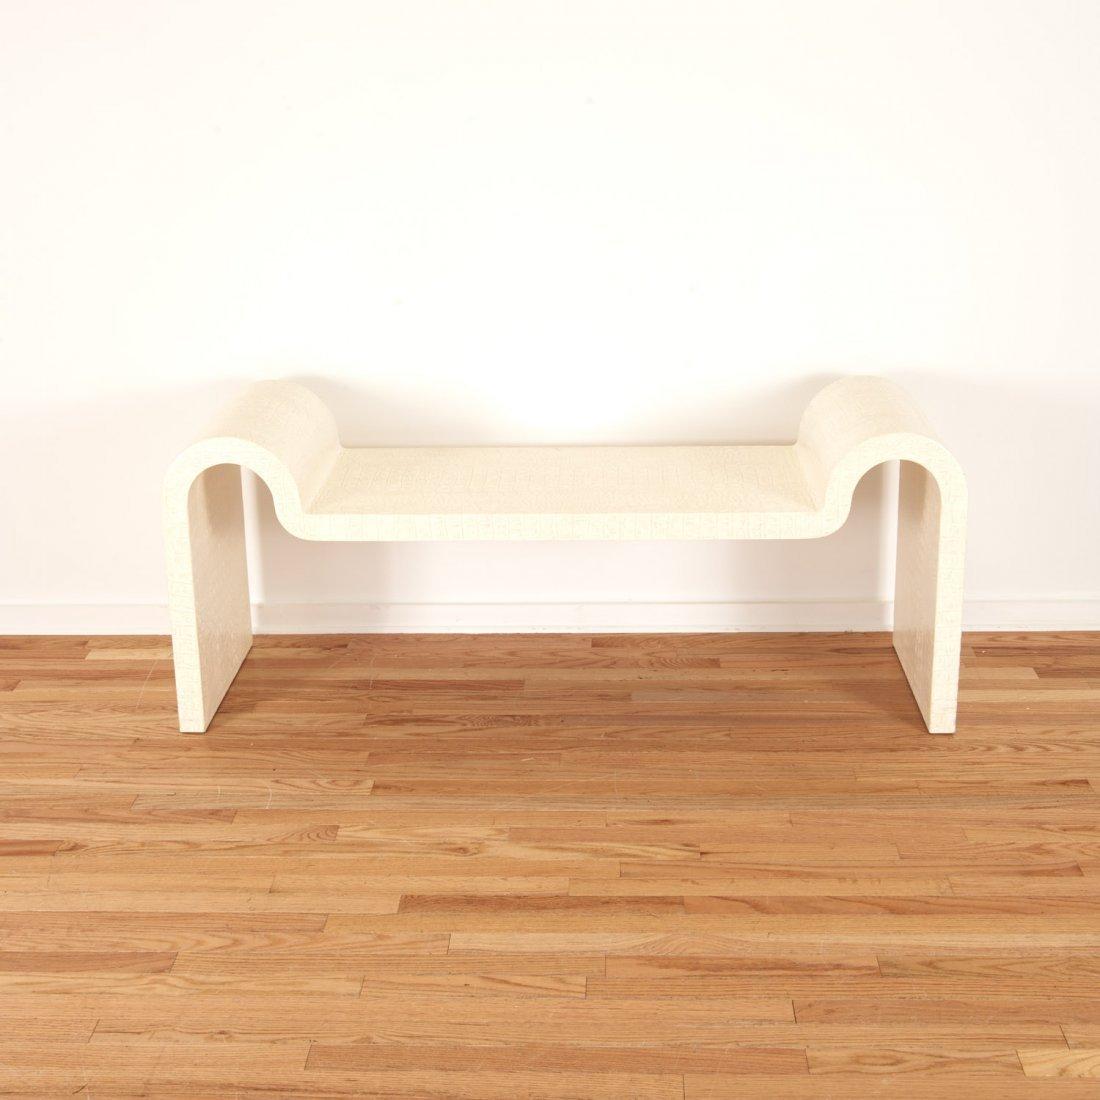 Karl Springer white faux gator sculpture bench - 2